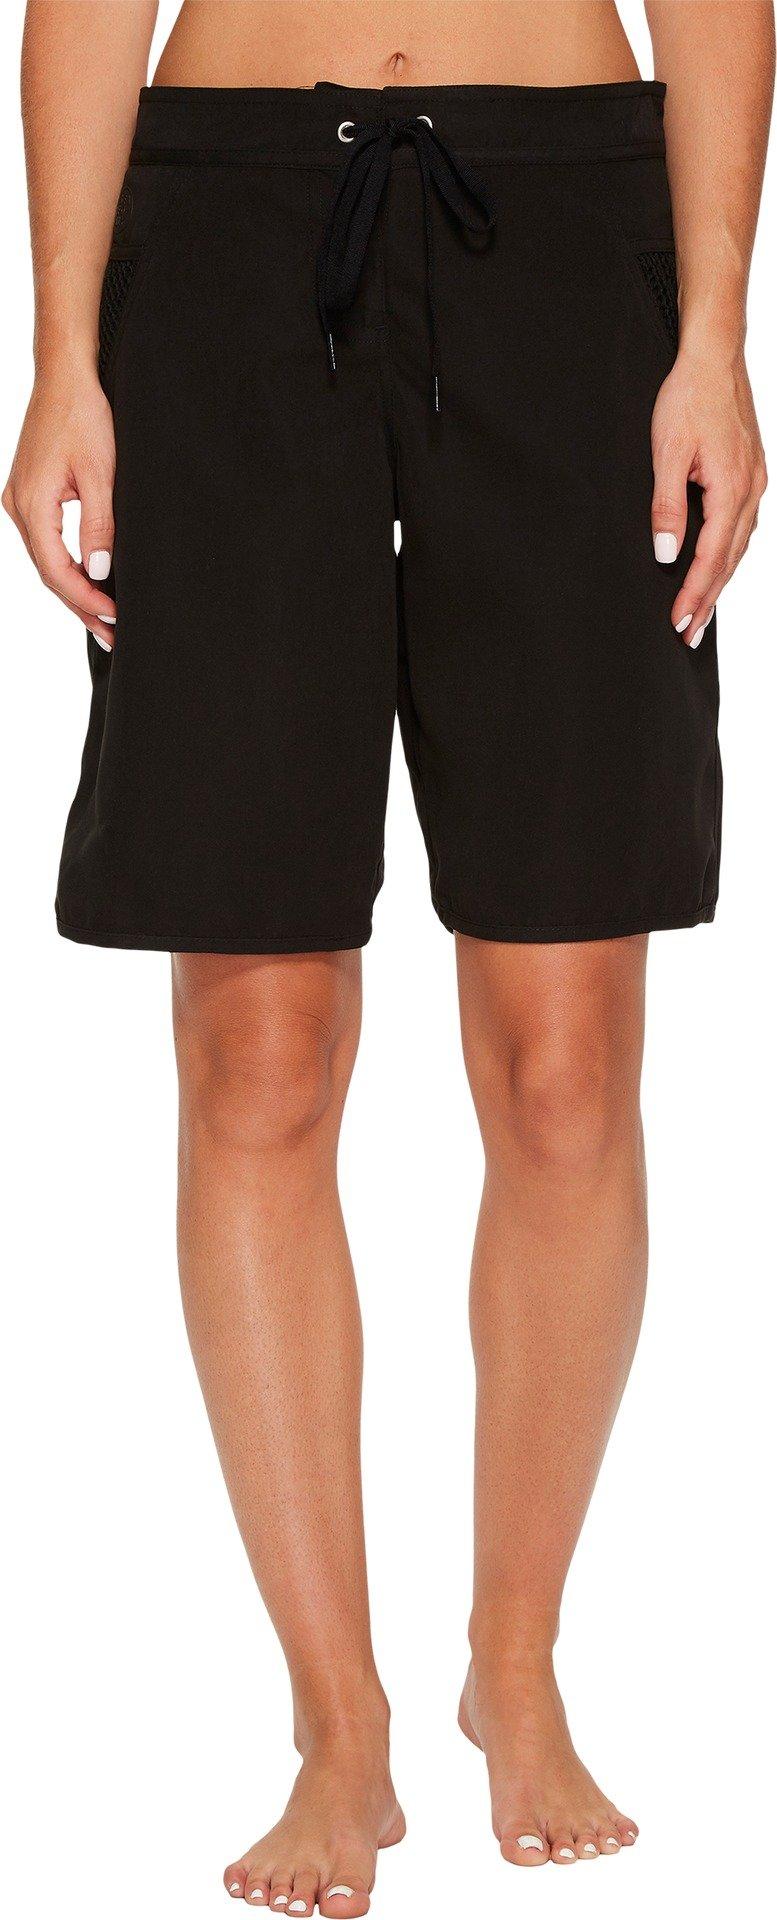 Seafolly Women's High Water Boardshorts Black Swimsuit Bottoms